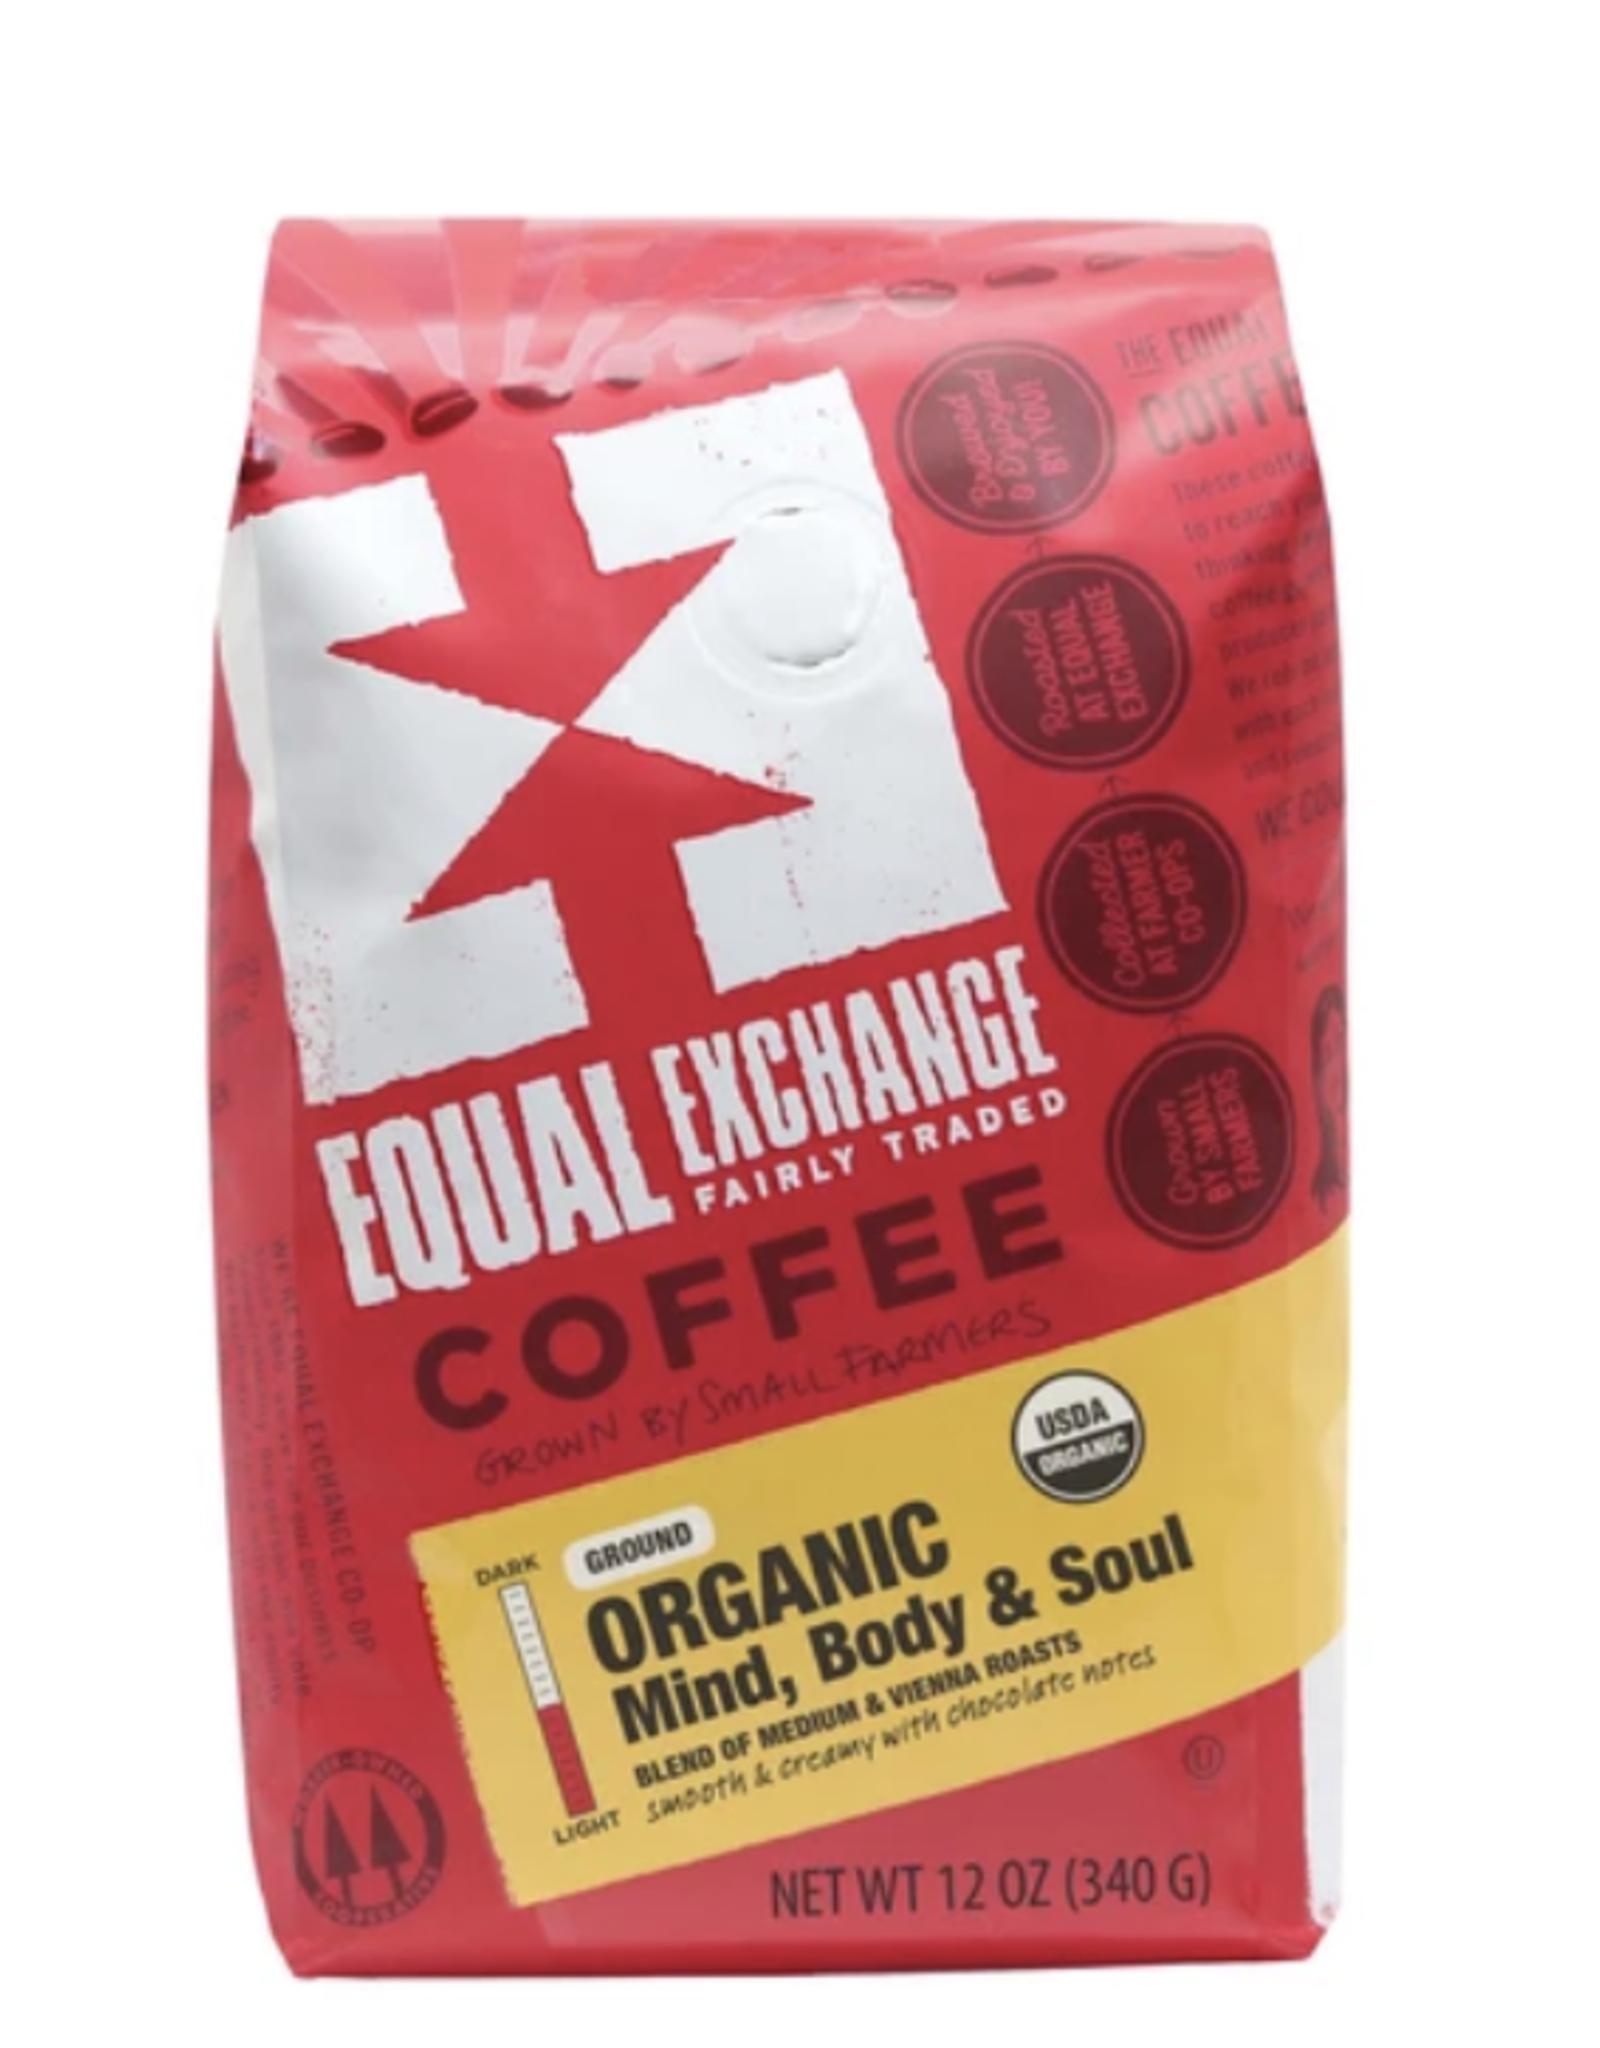 Coffee, Mind Body Soul Organic, 12 oz, Whole Bean